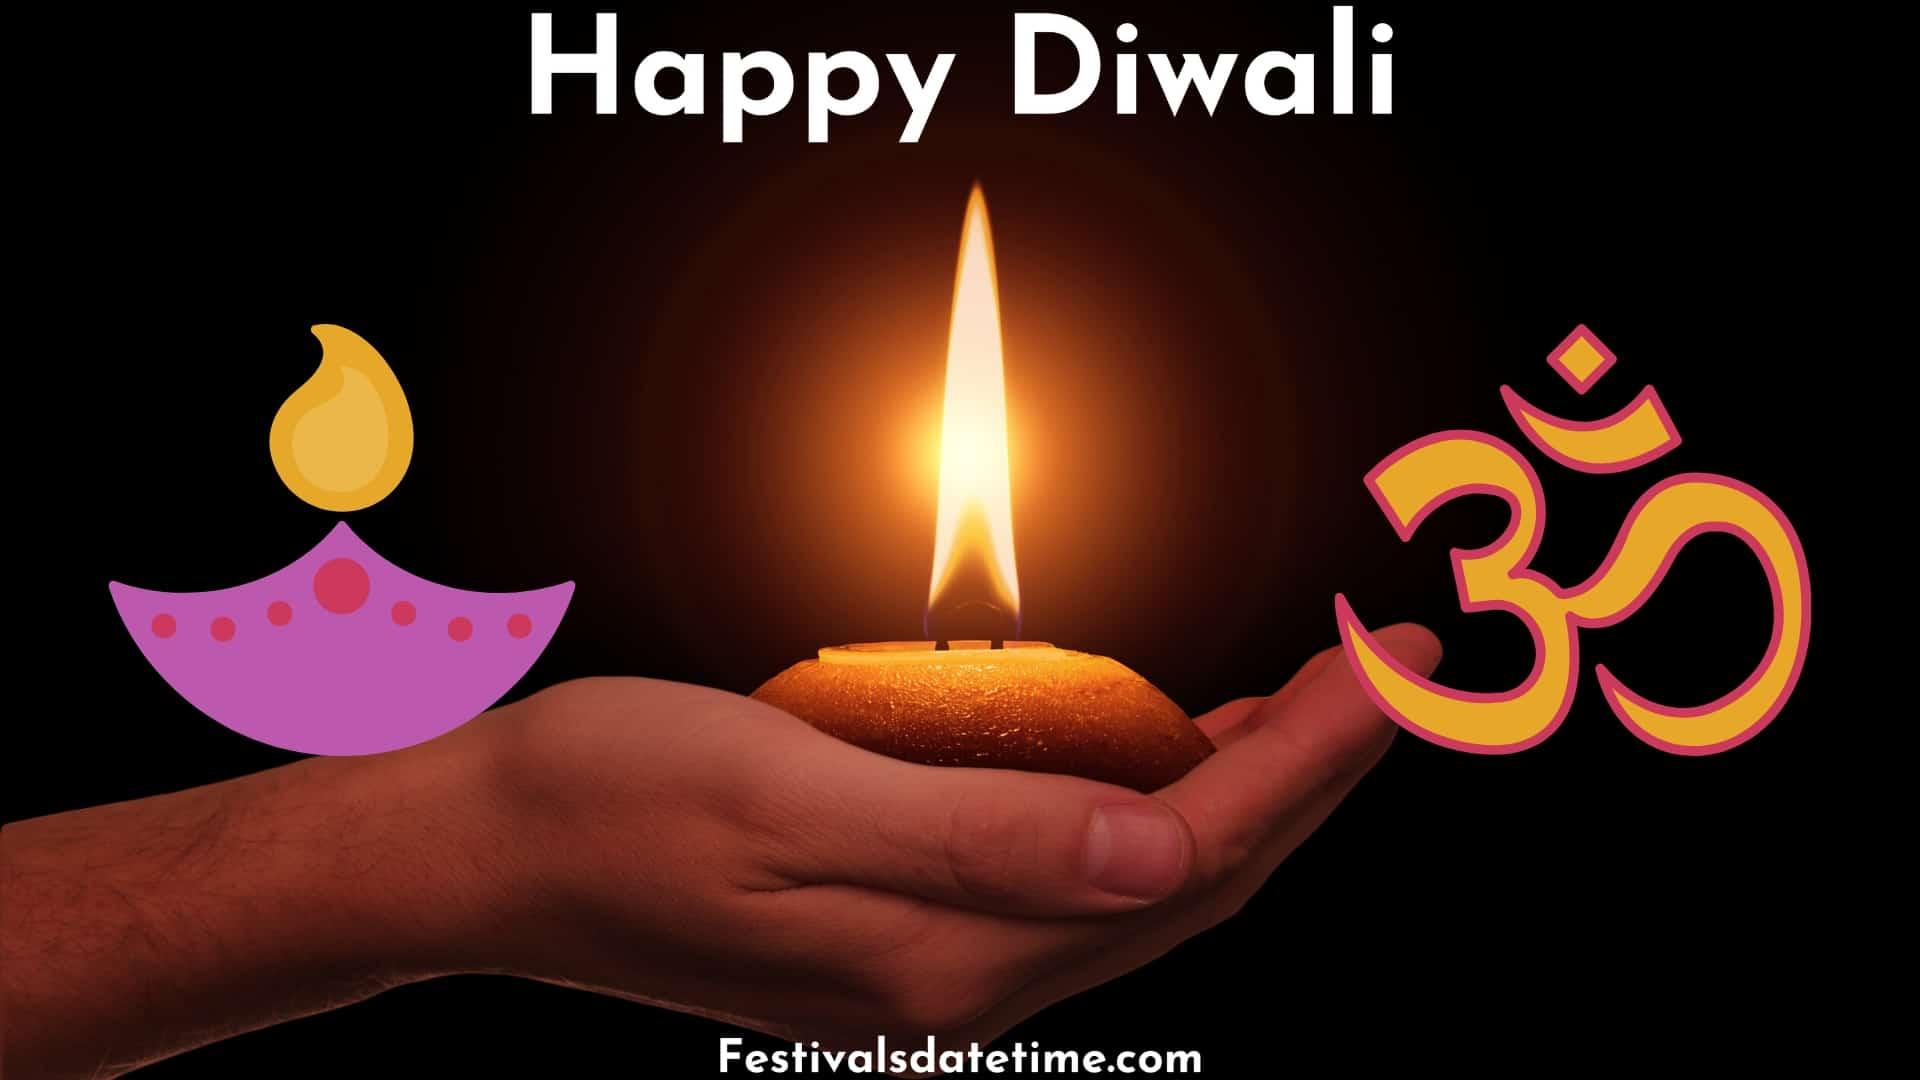 happy_diwali_hd_images_2021